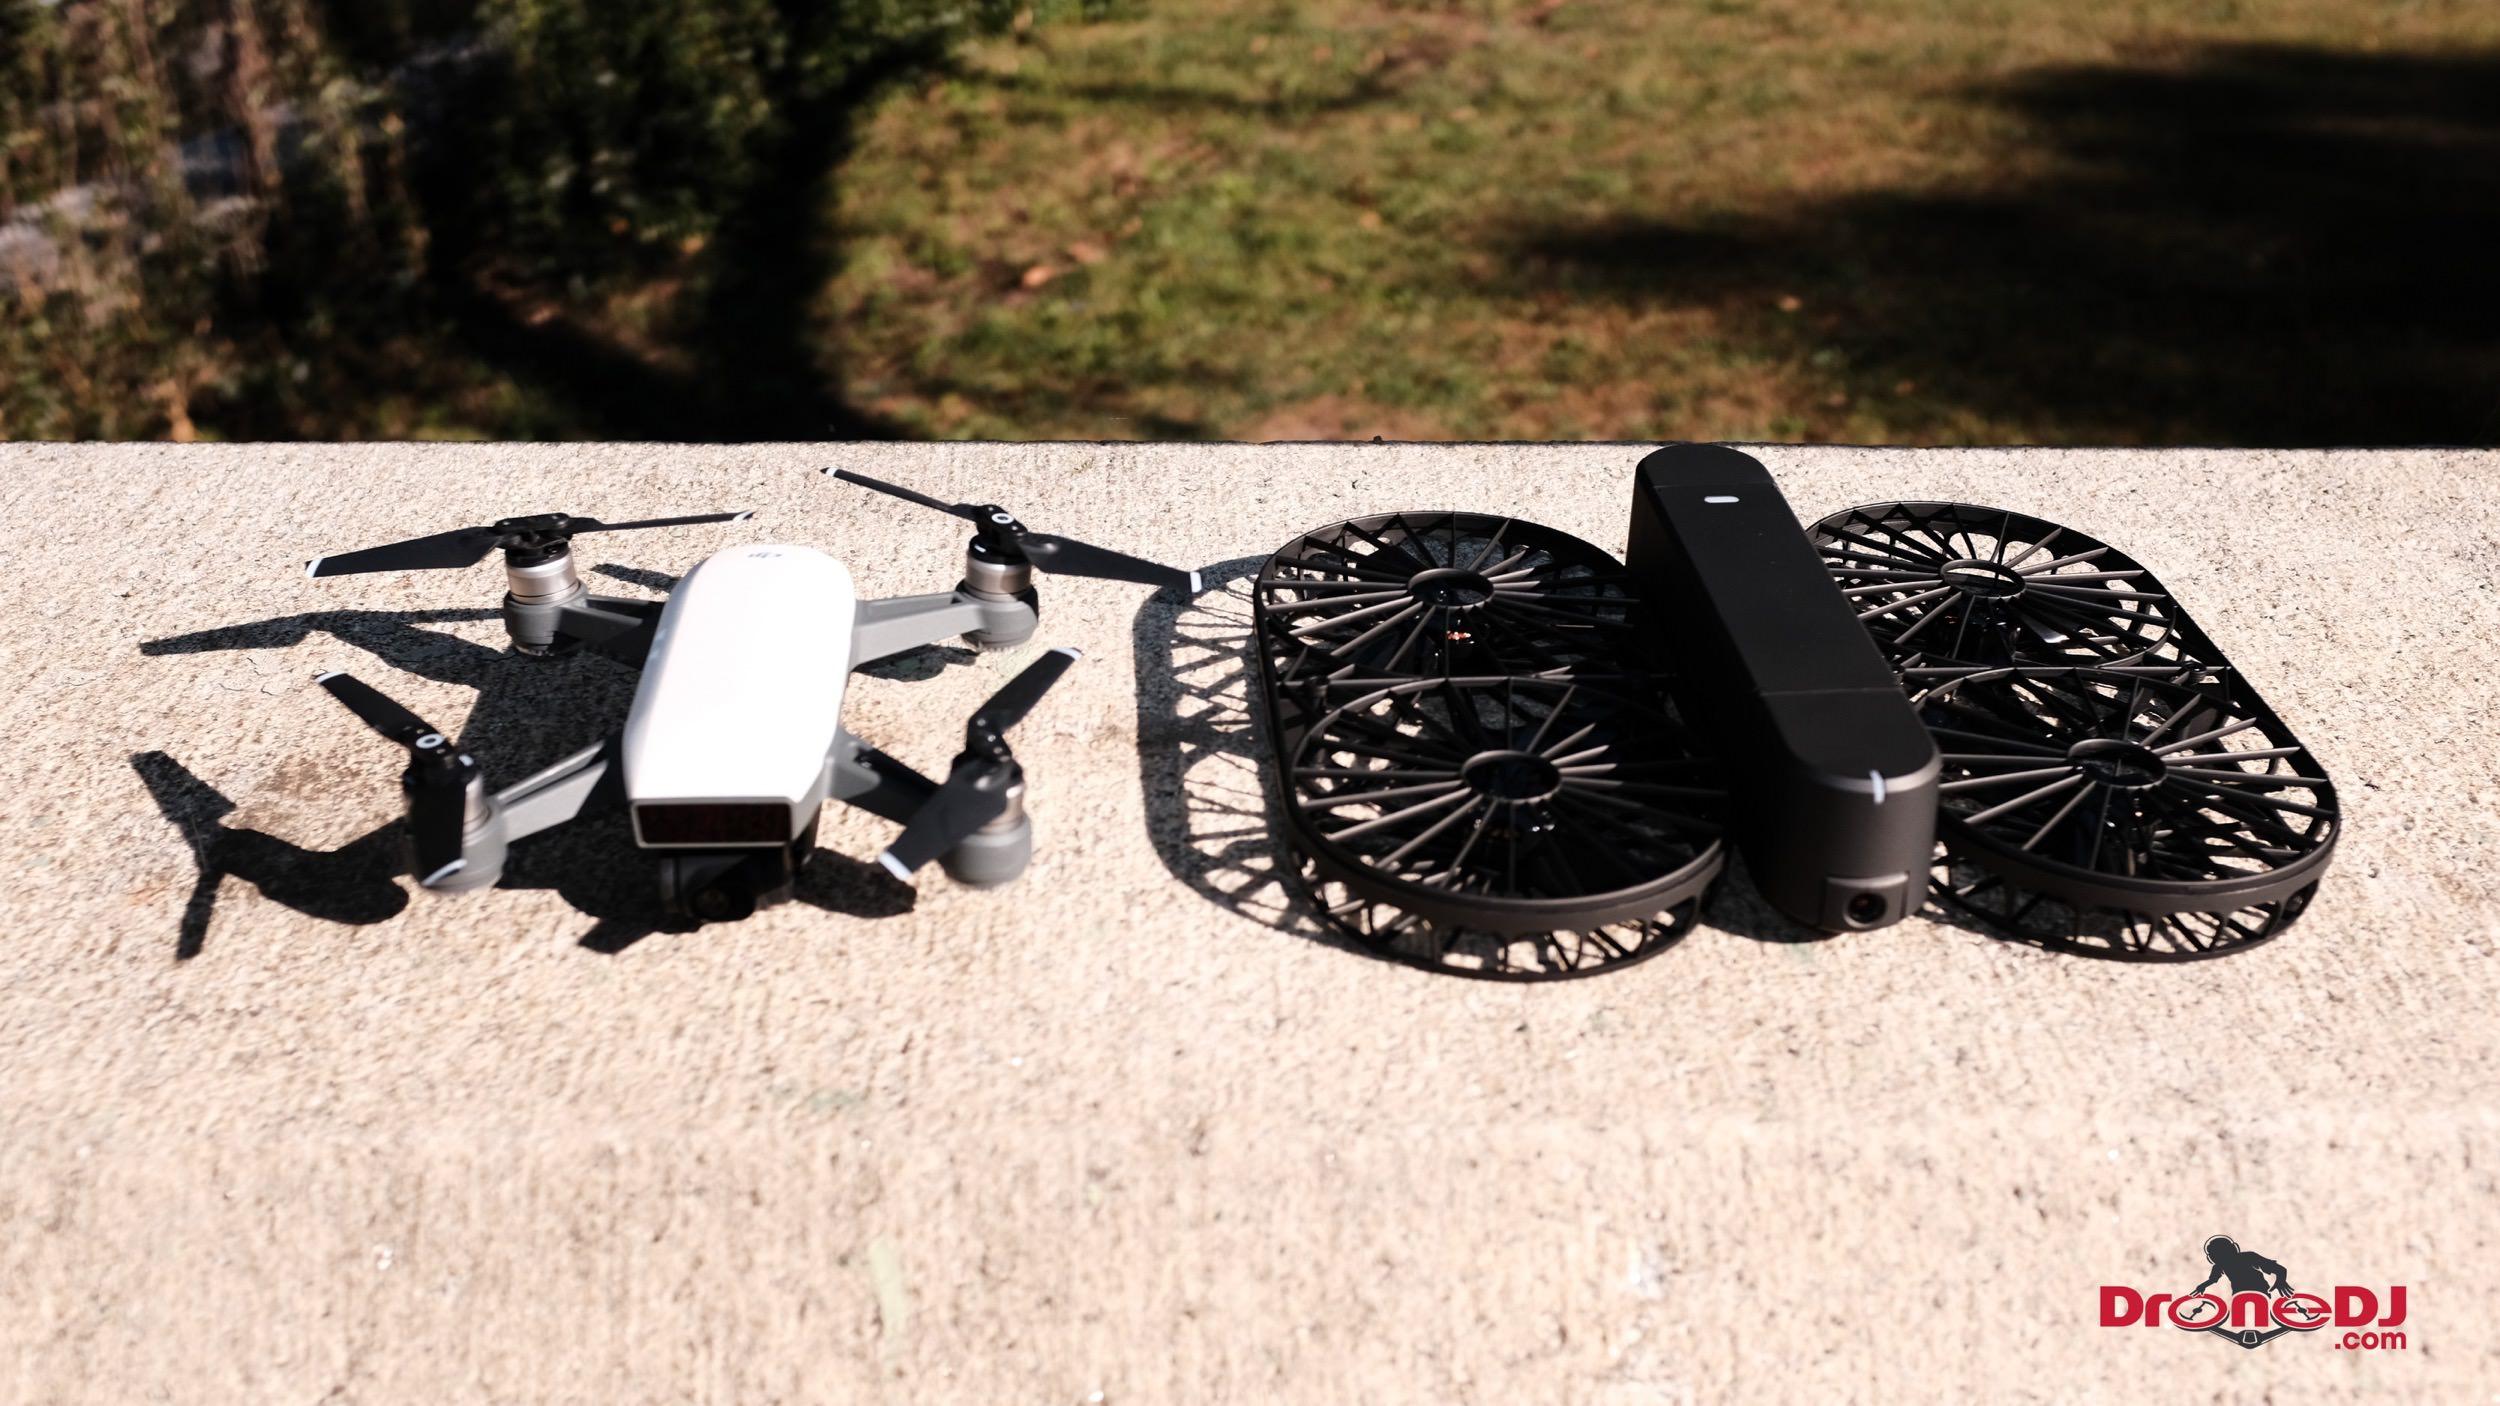 DroneDJ DJI Spark vs Moment Drone Foldable 4K Aerial Camera Drone-6